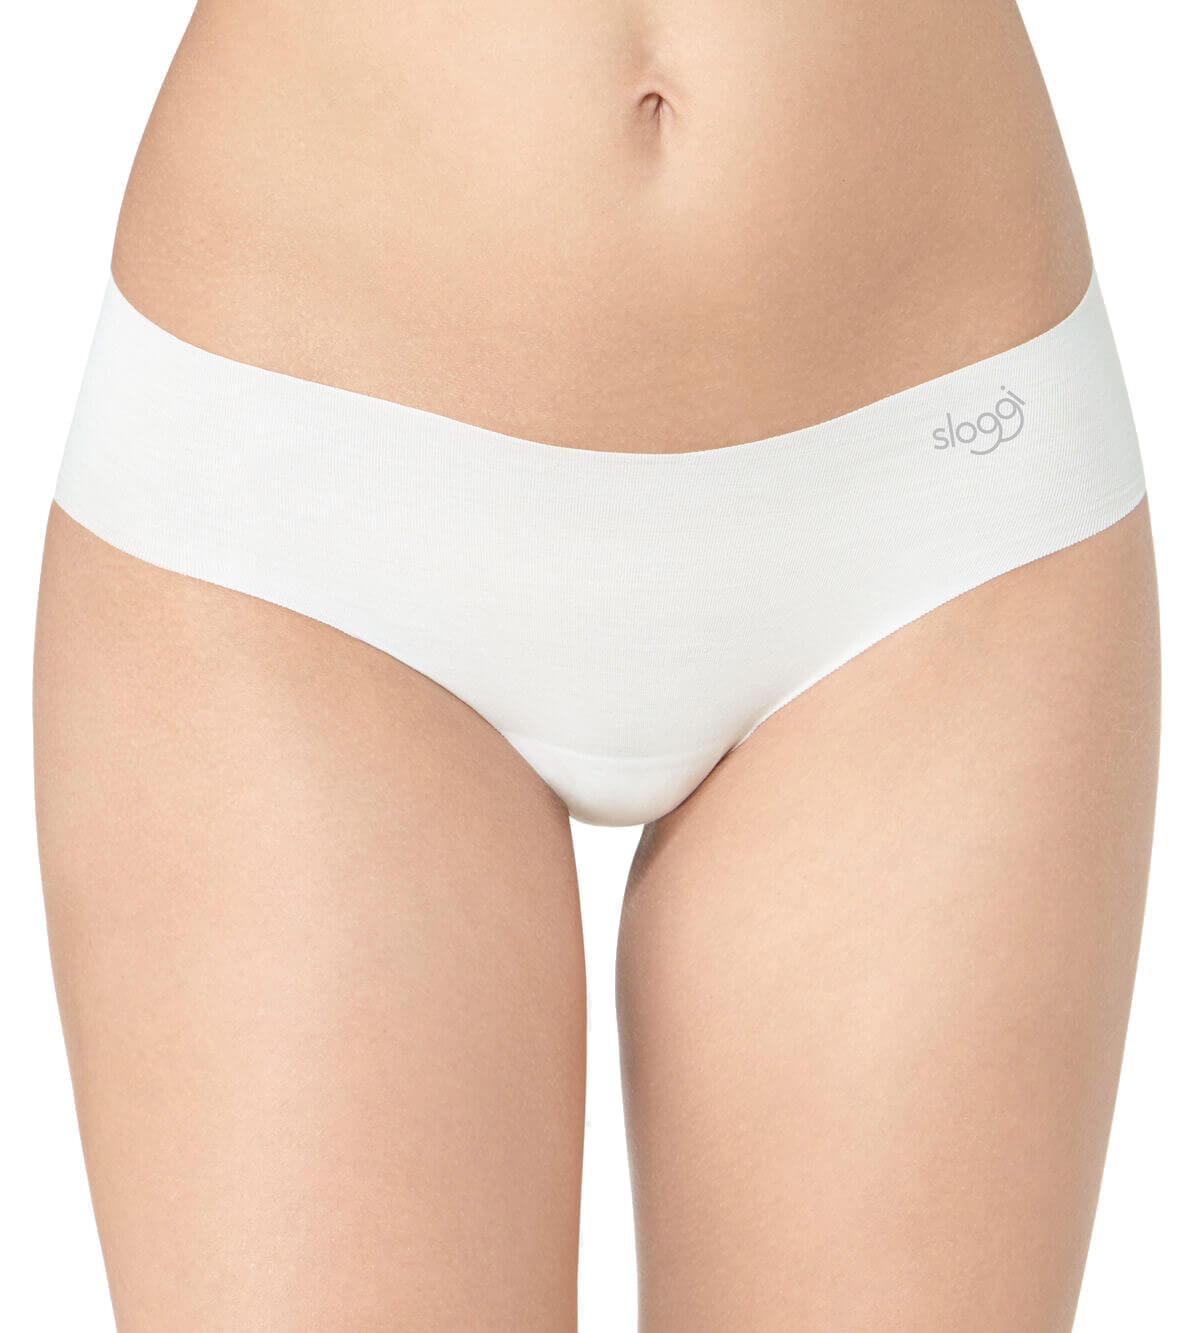 Sloggi Blue Zero Modal Short Damen Unterhose Frauen Panty 10184932